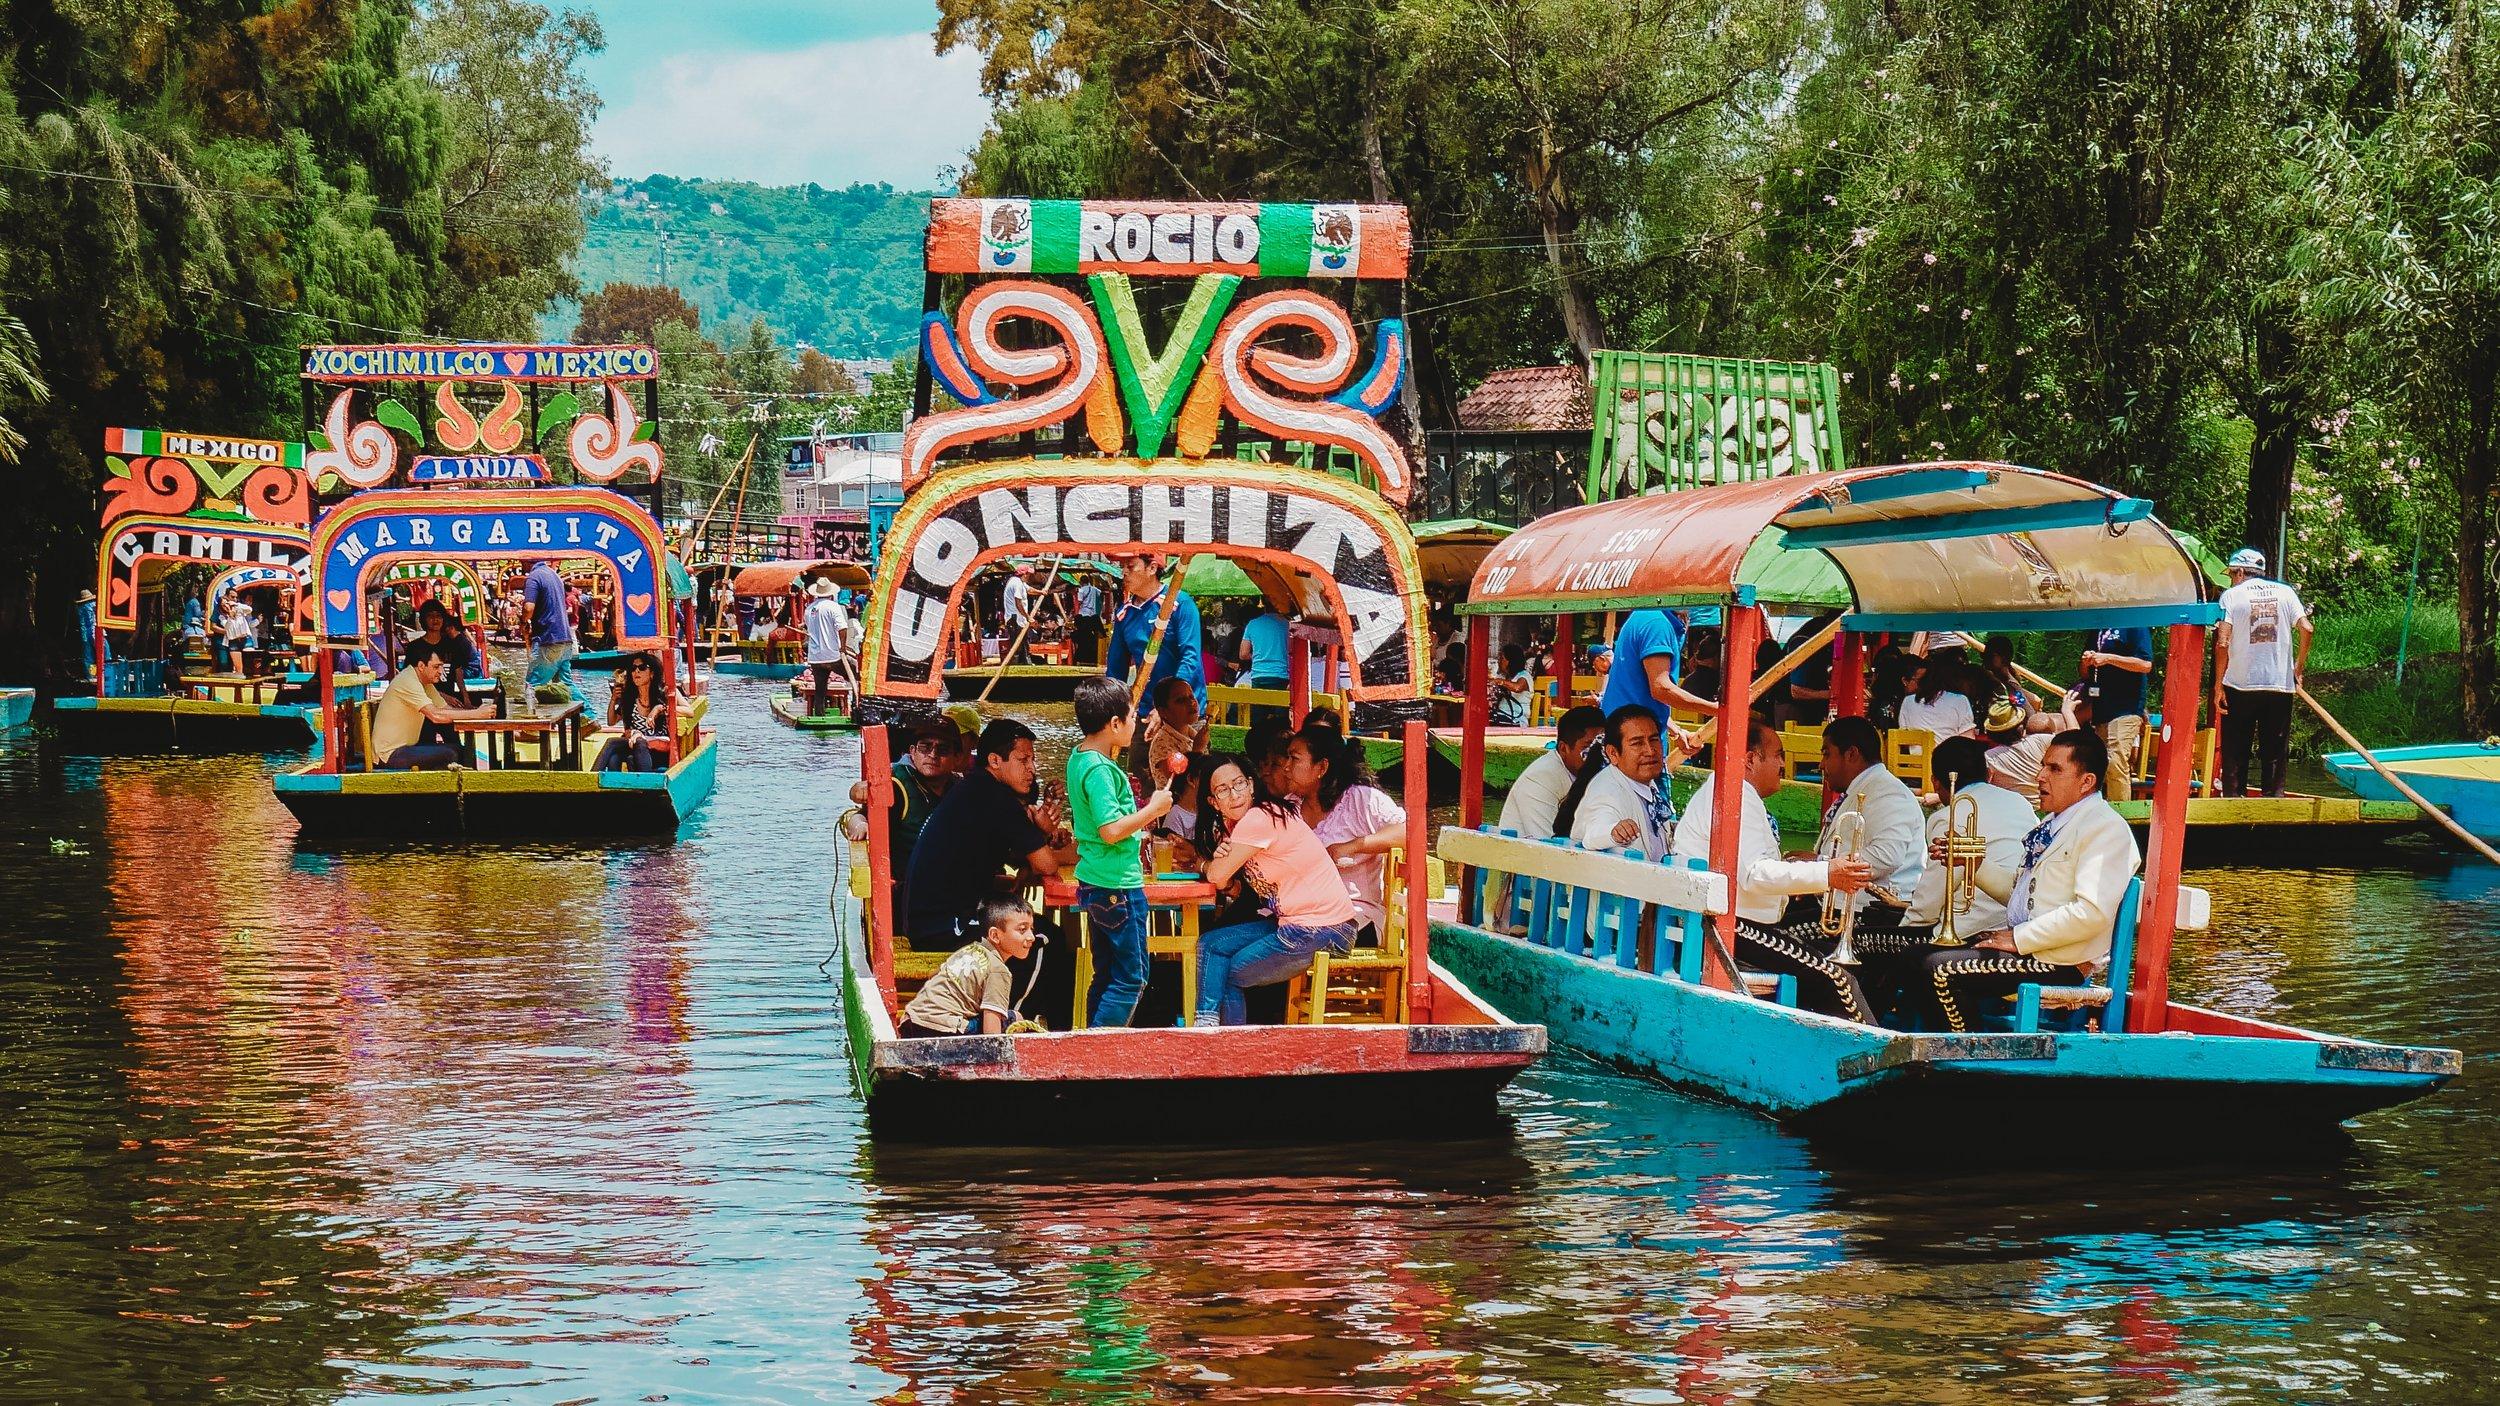 Gondola ride in Xochimilco